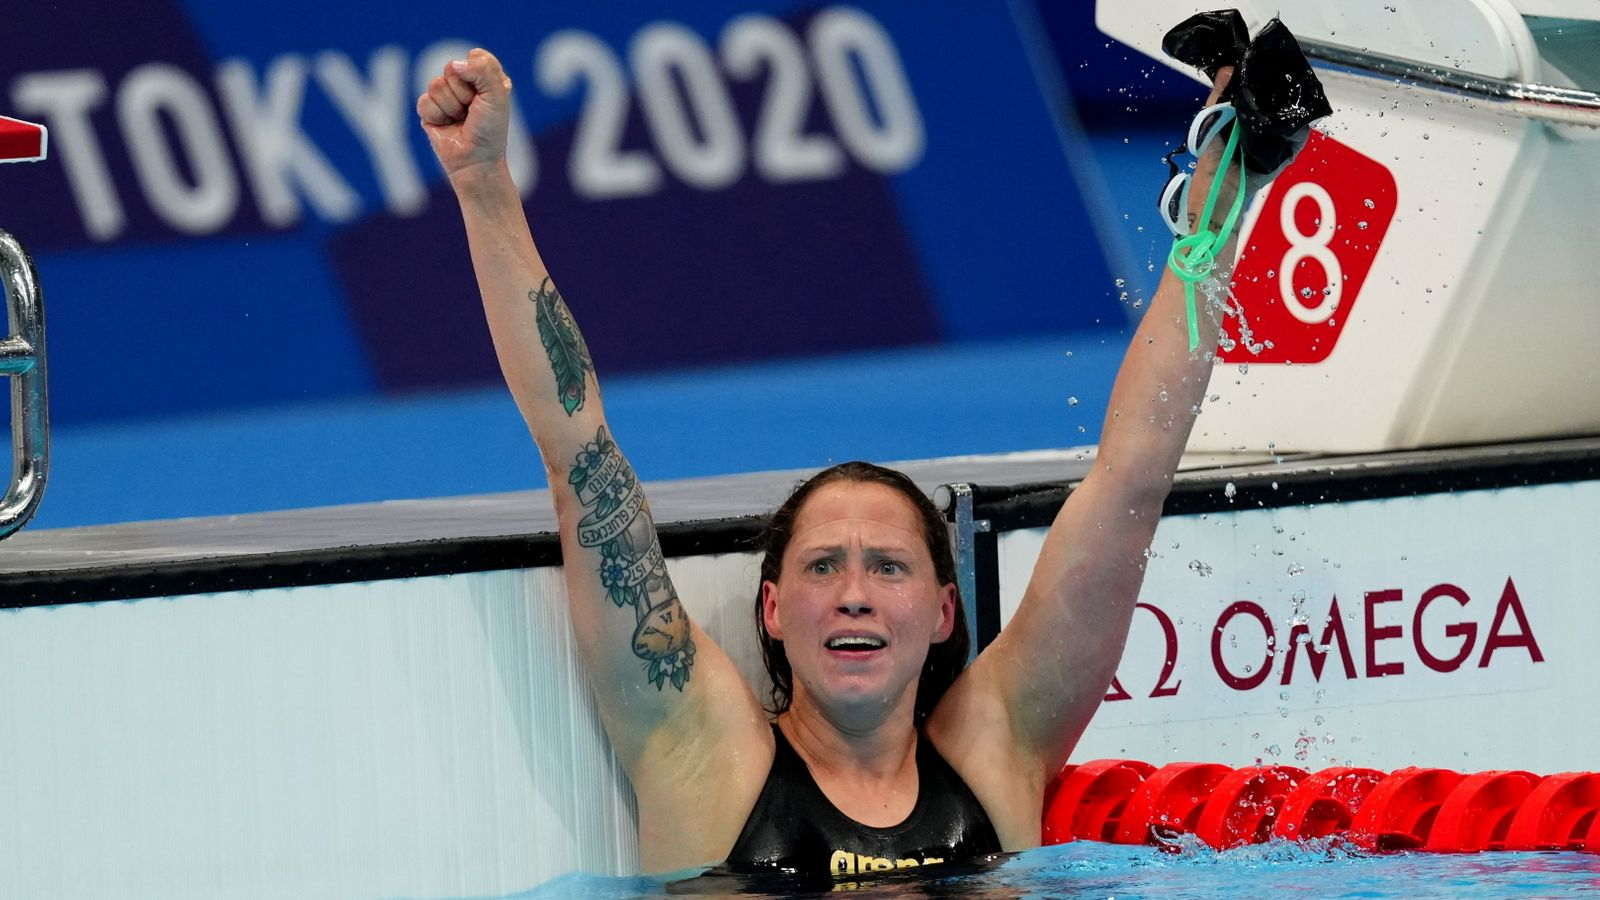 Swimming - Women's 200m Individual Medley - Final